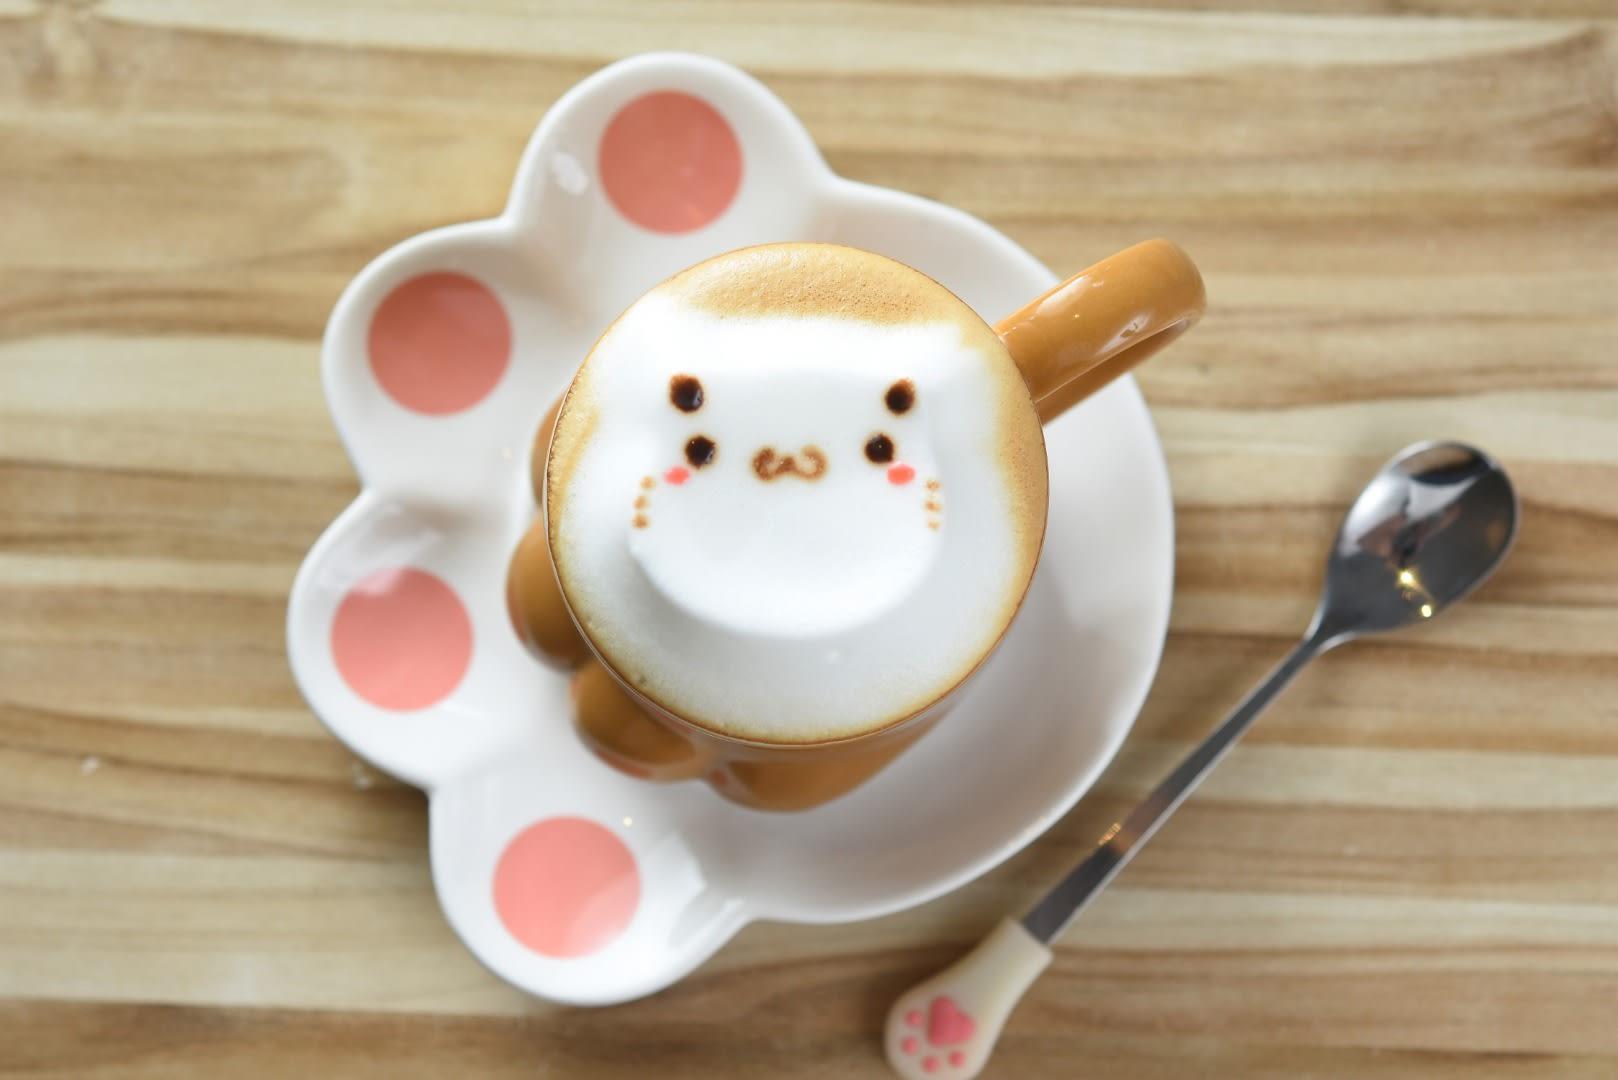 taipei-mrt-guide-the-who-cafe